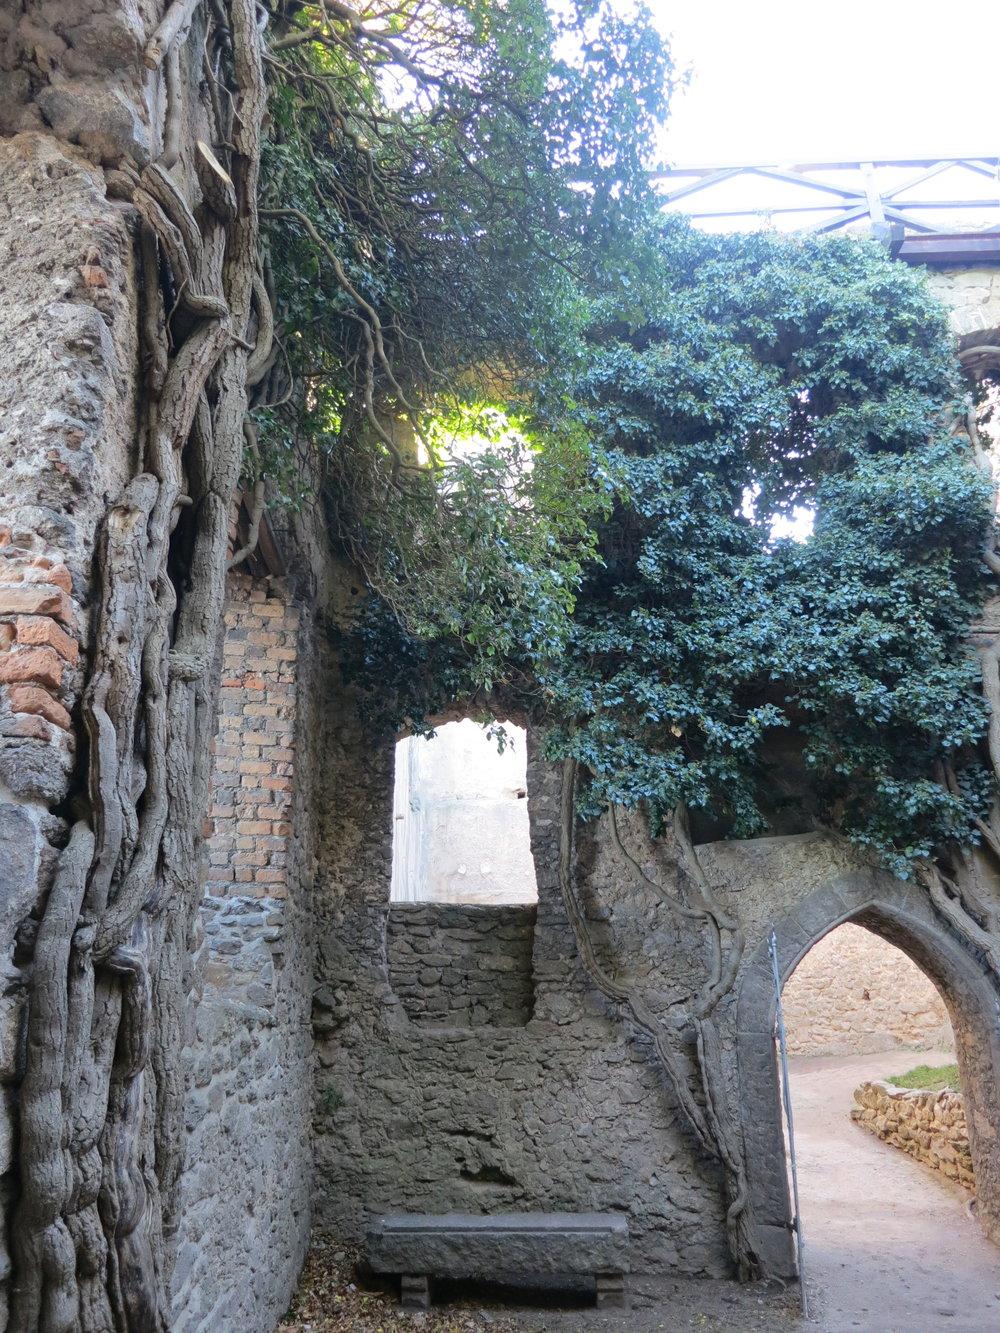 Chojnik Castle courtyard with climbing trees; Zamkowa, Jelenia Góra, Poland